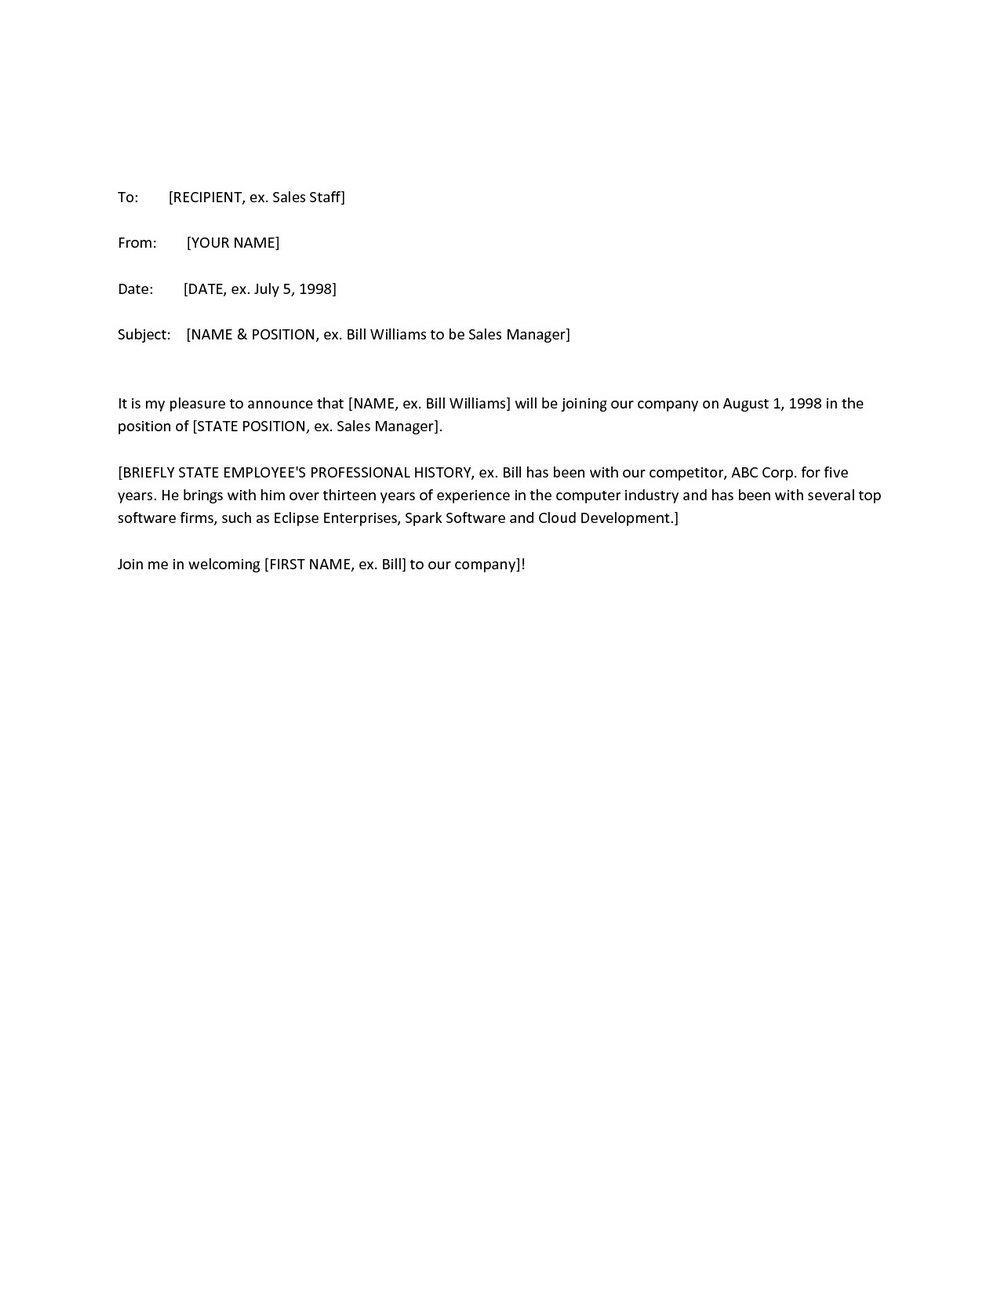 Employee Termination Announcement Template